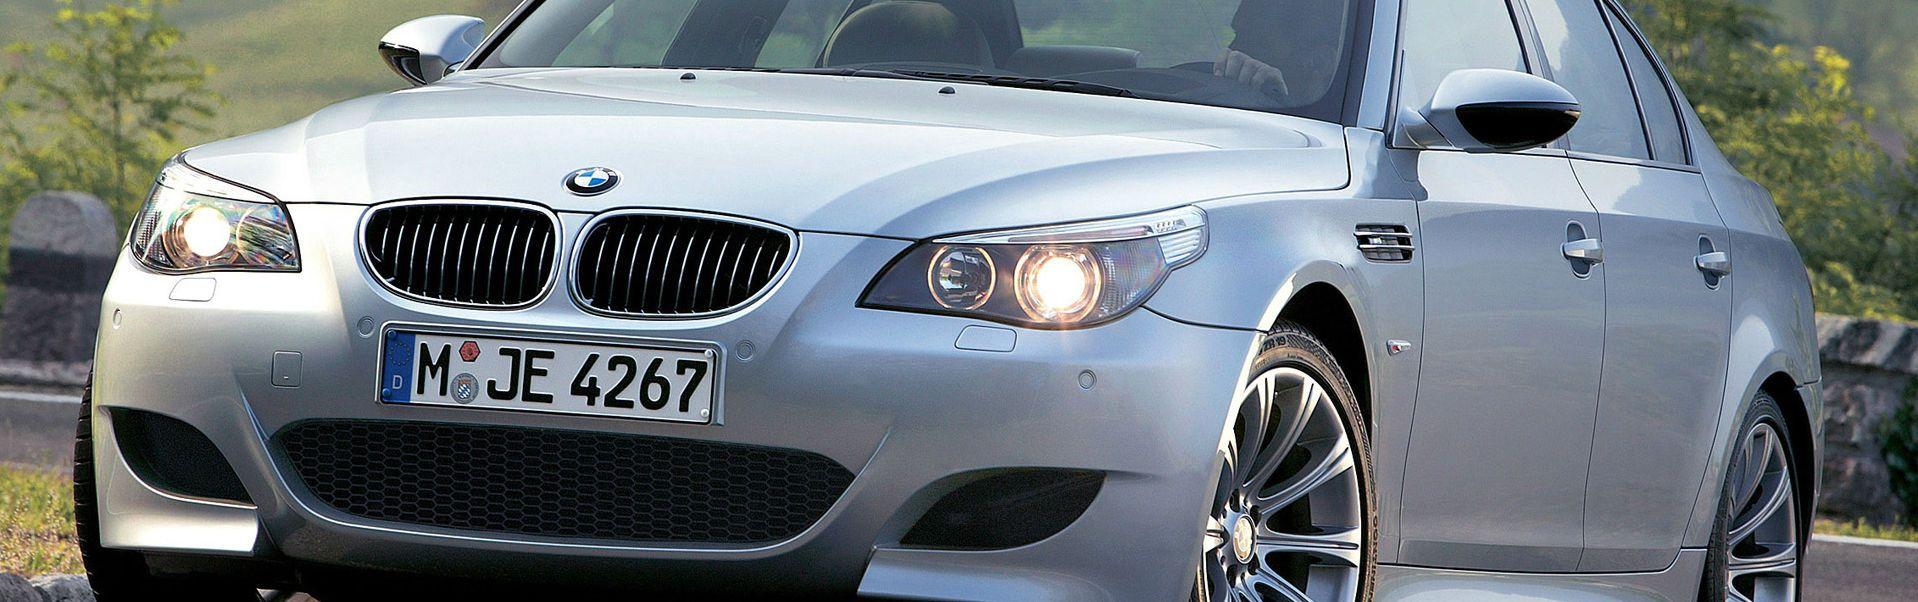 BMW Repair and Service in Las Vegas, NV Bmw m5, Bmw, Bmw